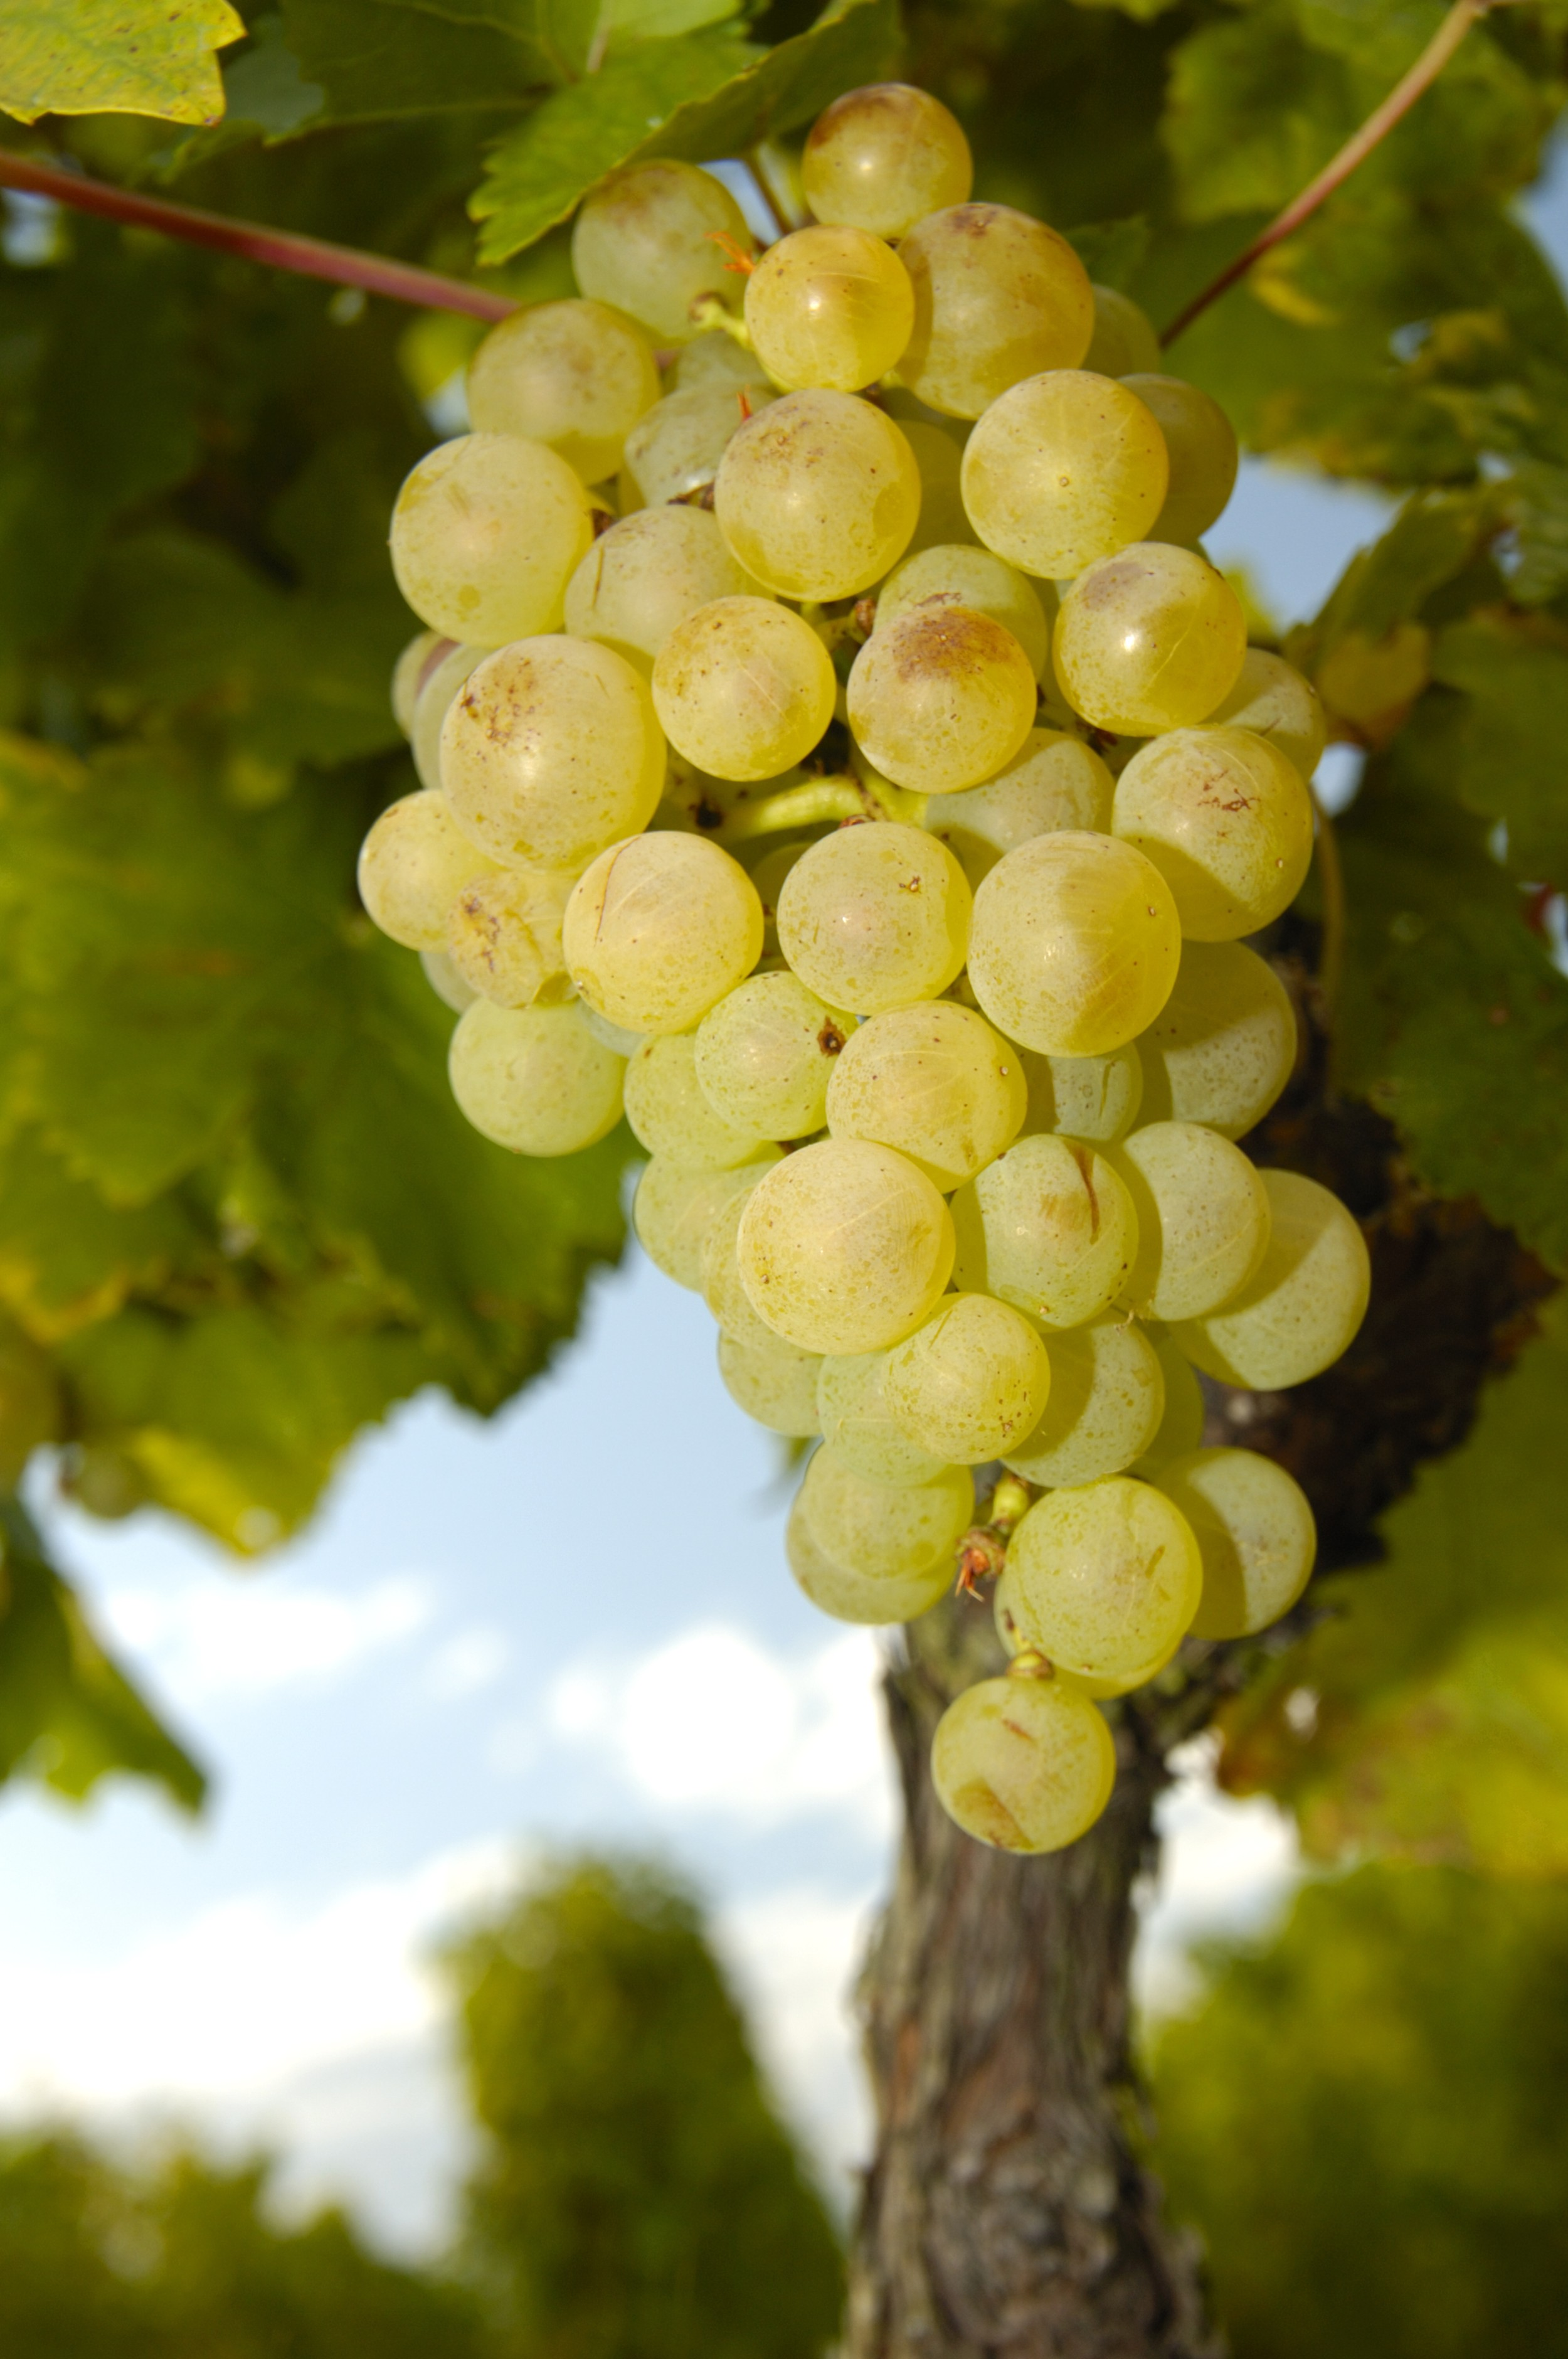 tipos de uvas variedades infoescola